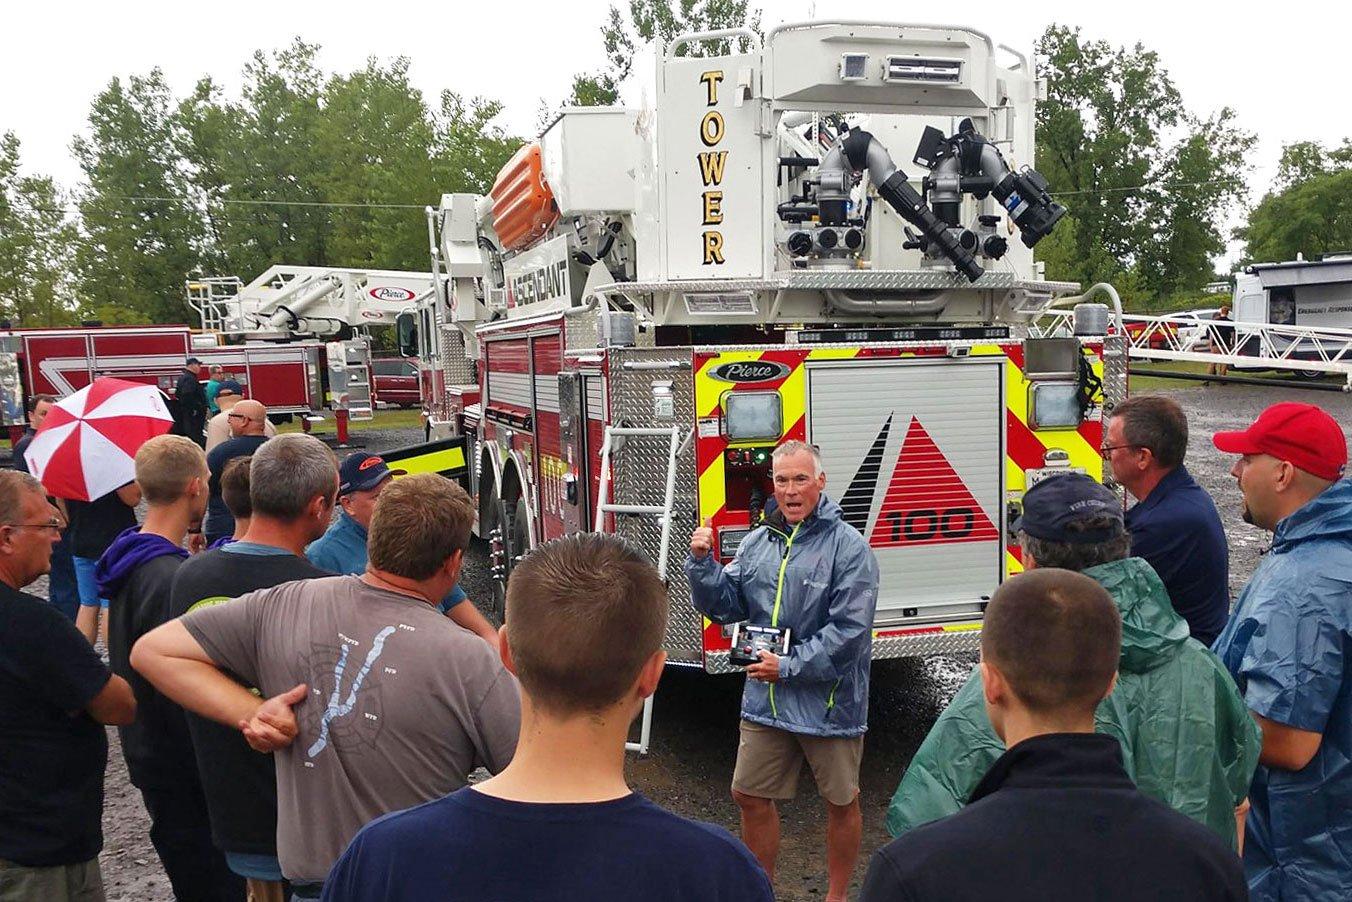 Pierce Road Rally Fire Truck Demo